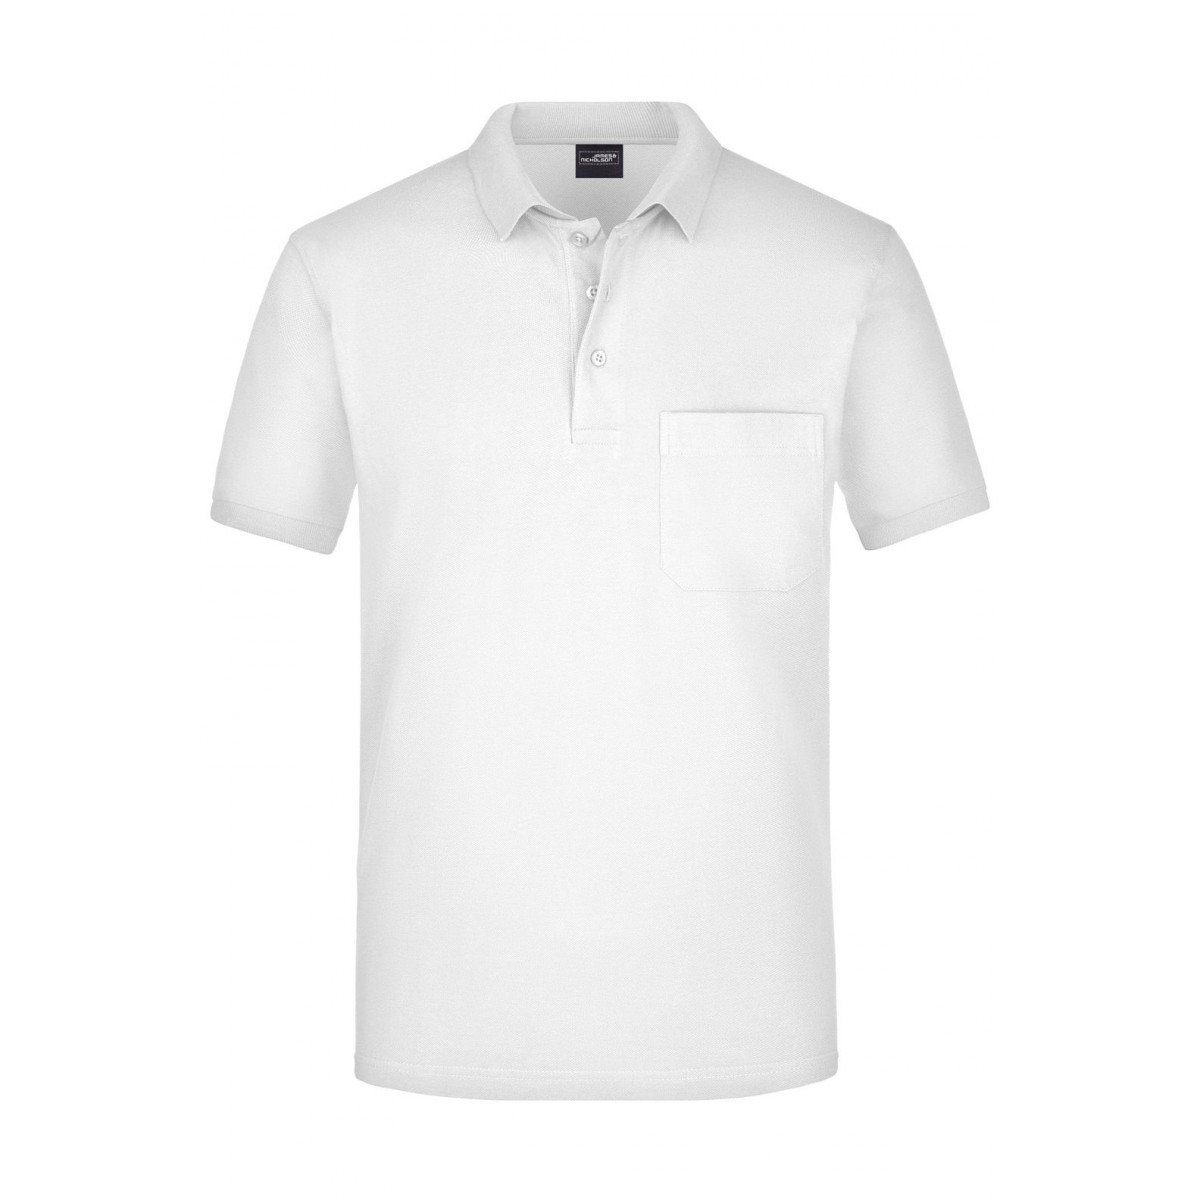 Рубашка поло мужская JN922 Mens Polo Pocket - Белый